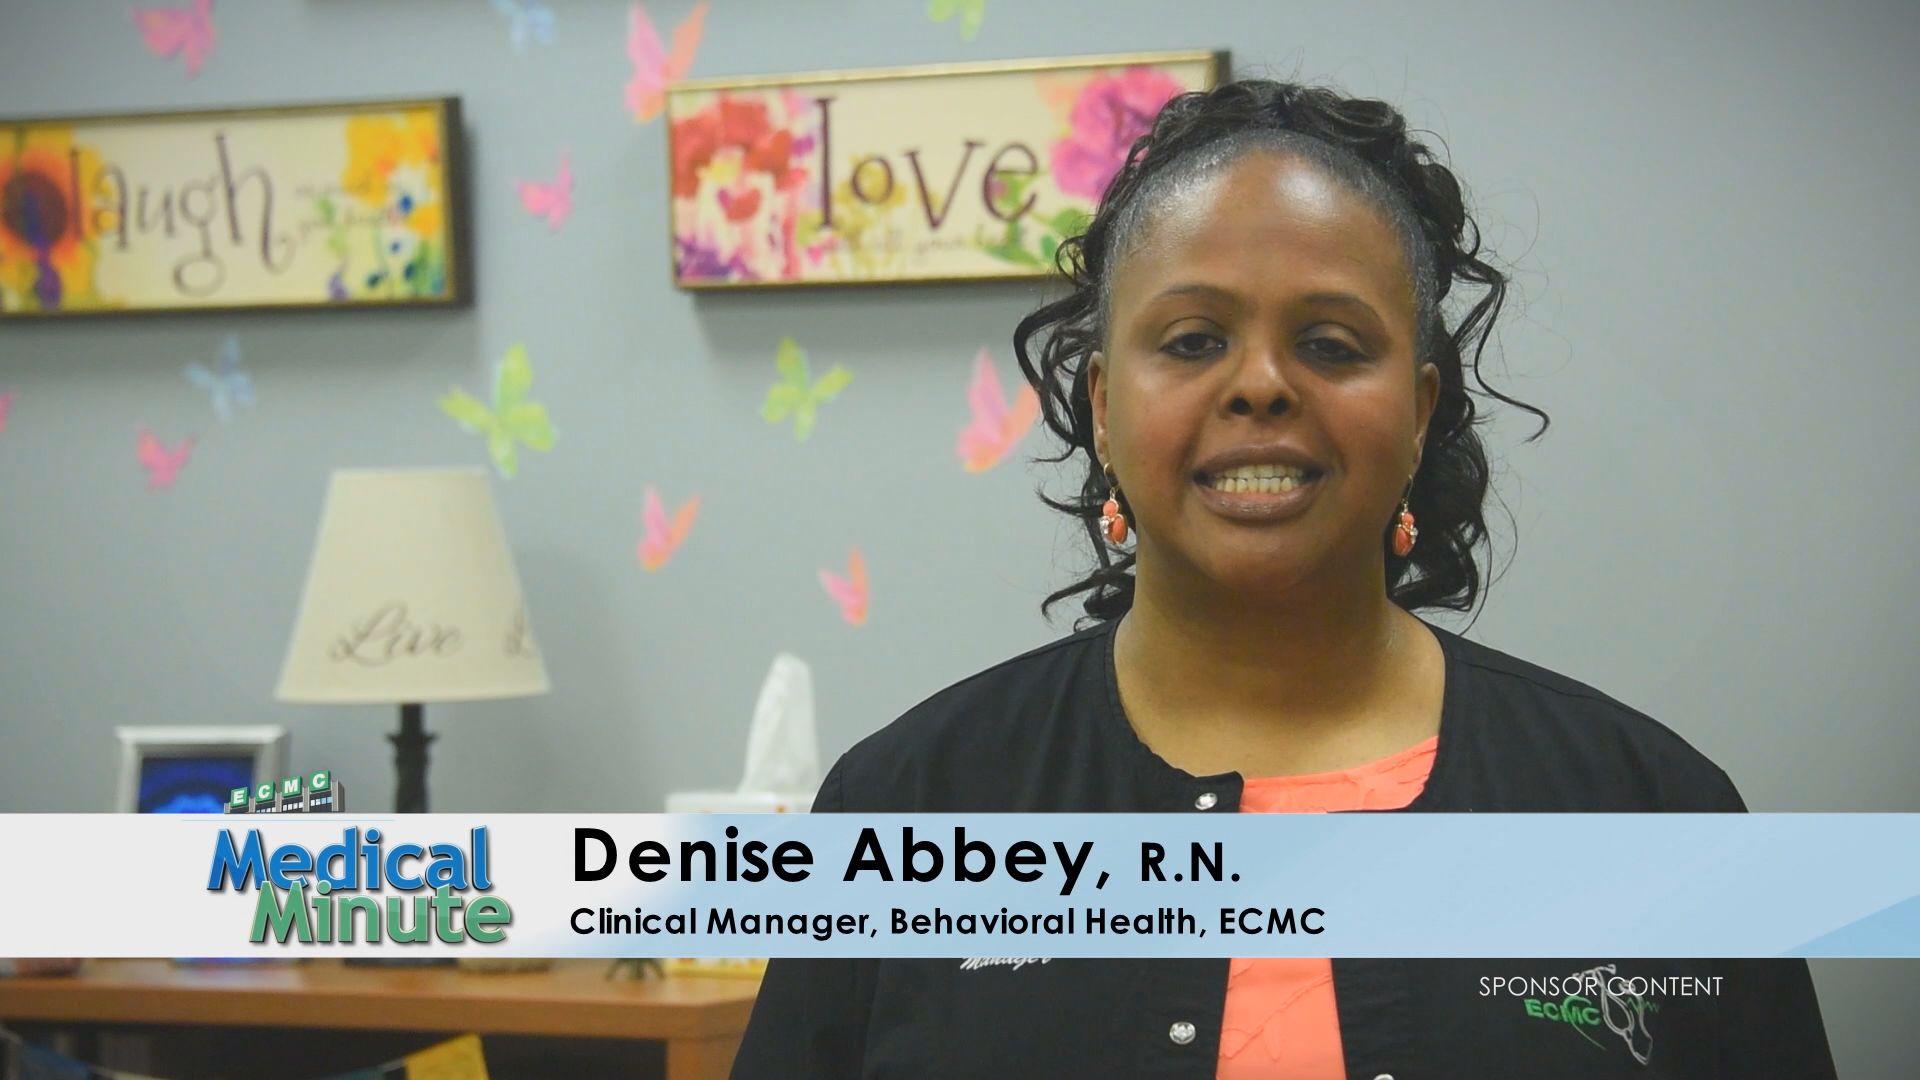 ECMCMedicalMinute DeniseAbbey Depression 051319 STILL